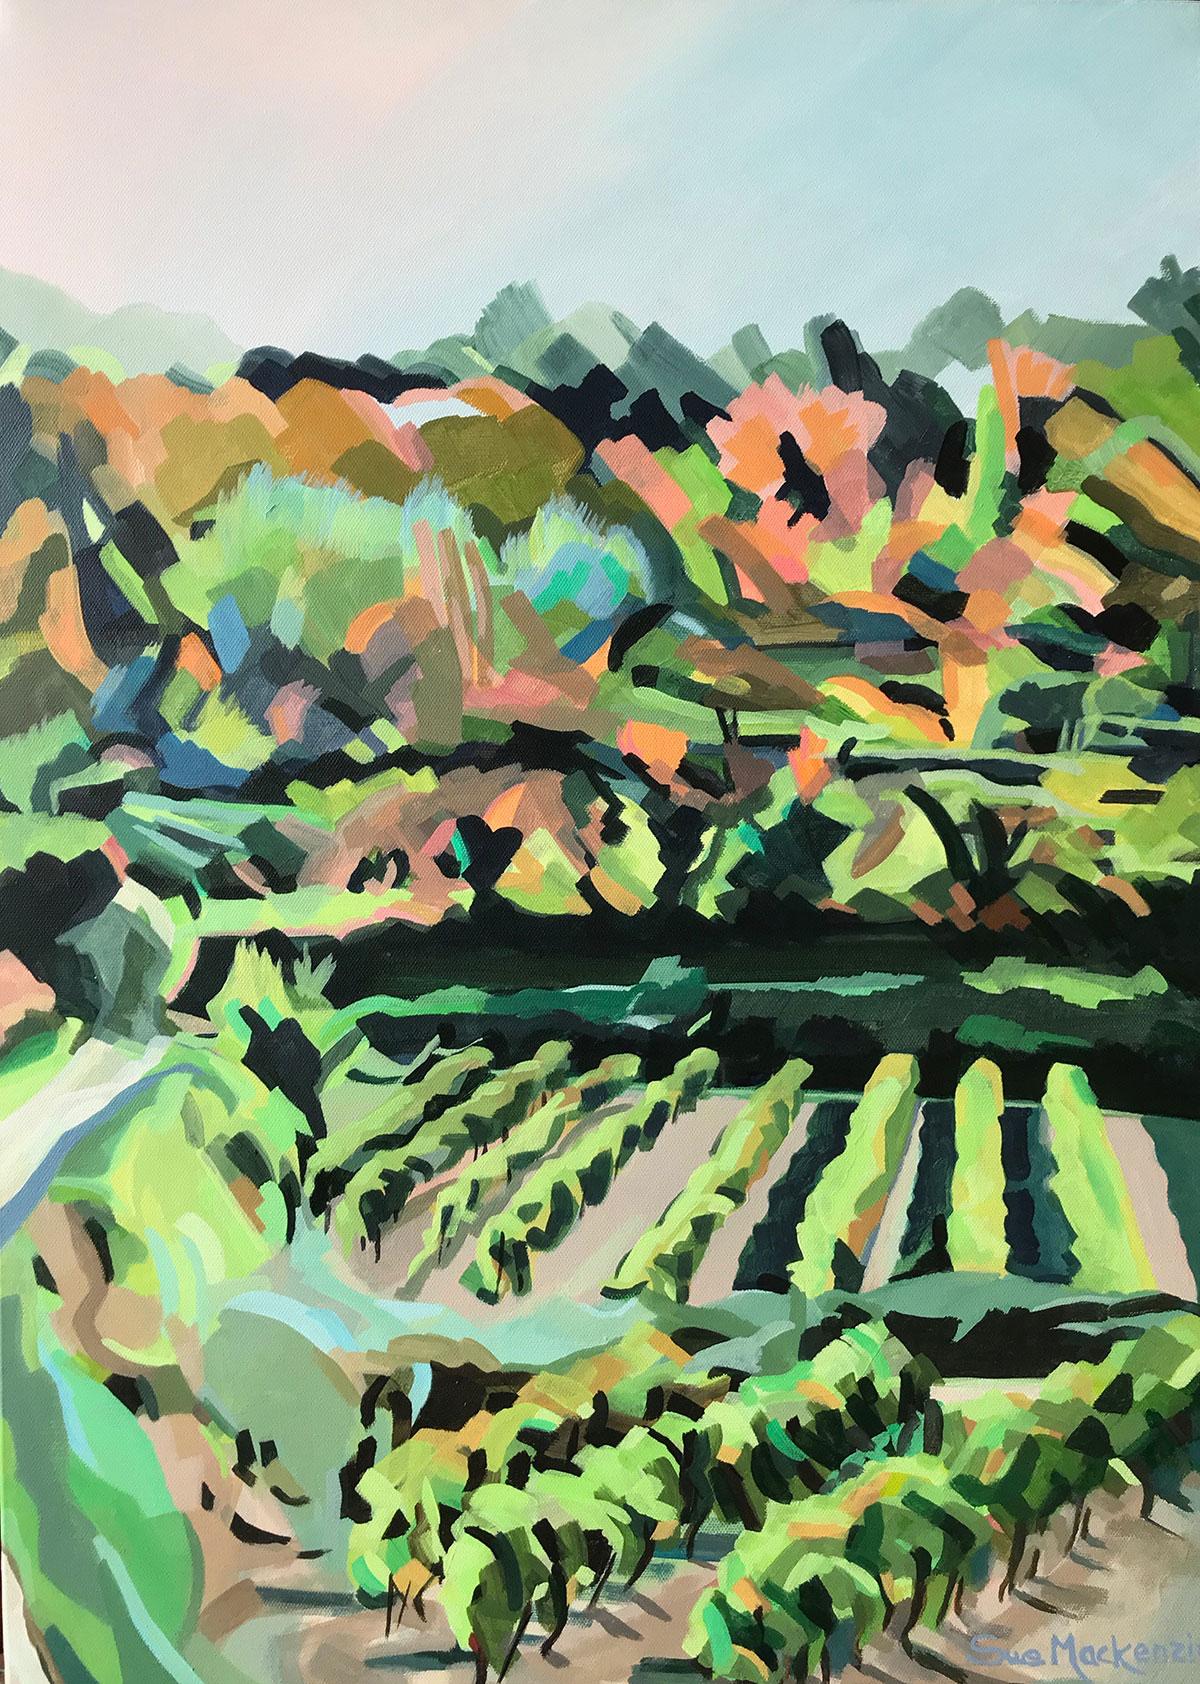 South Valley Luberon - Acrylic on Canvas - 70cm x 50cm - unframed